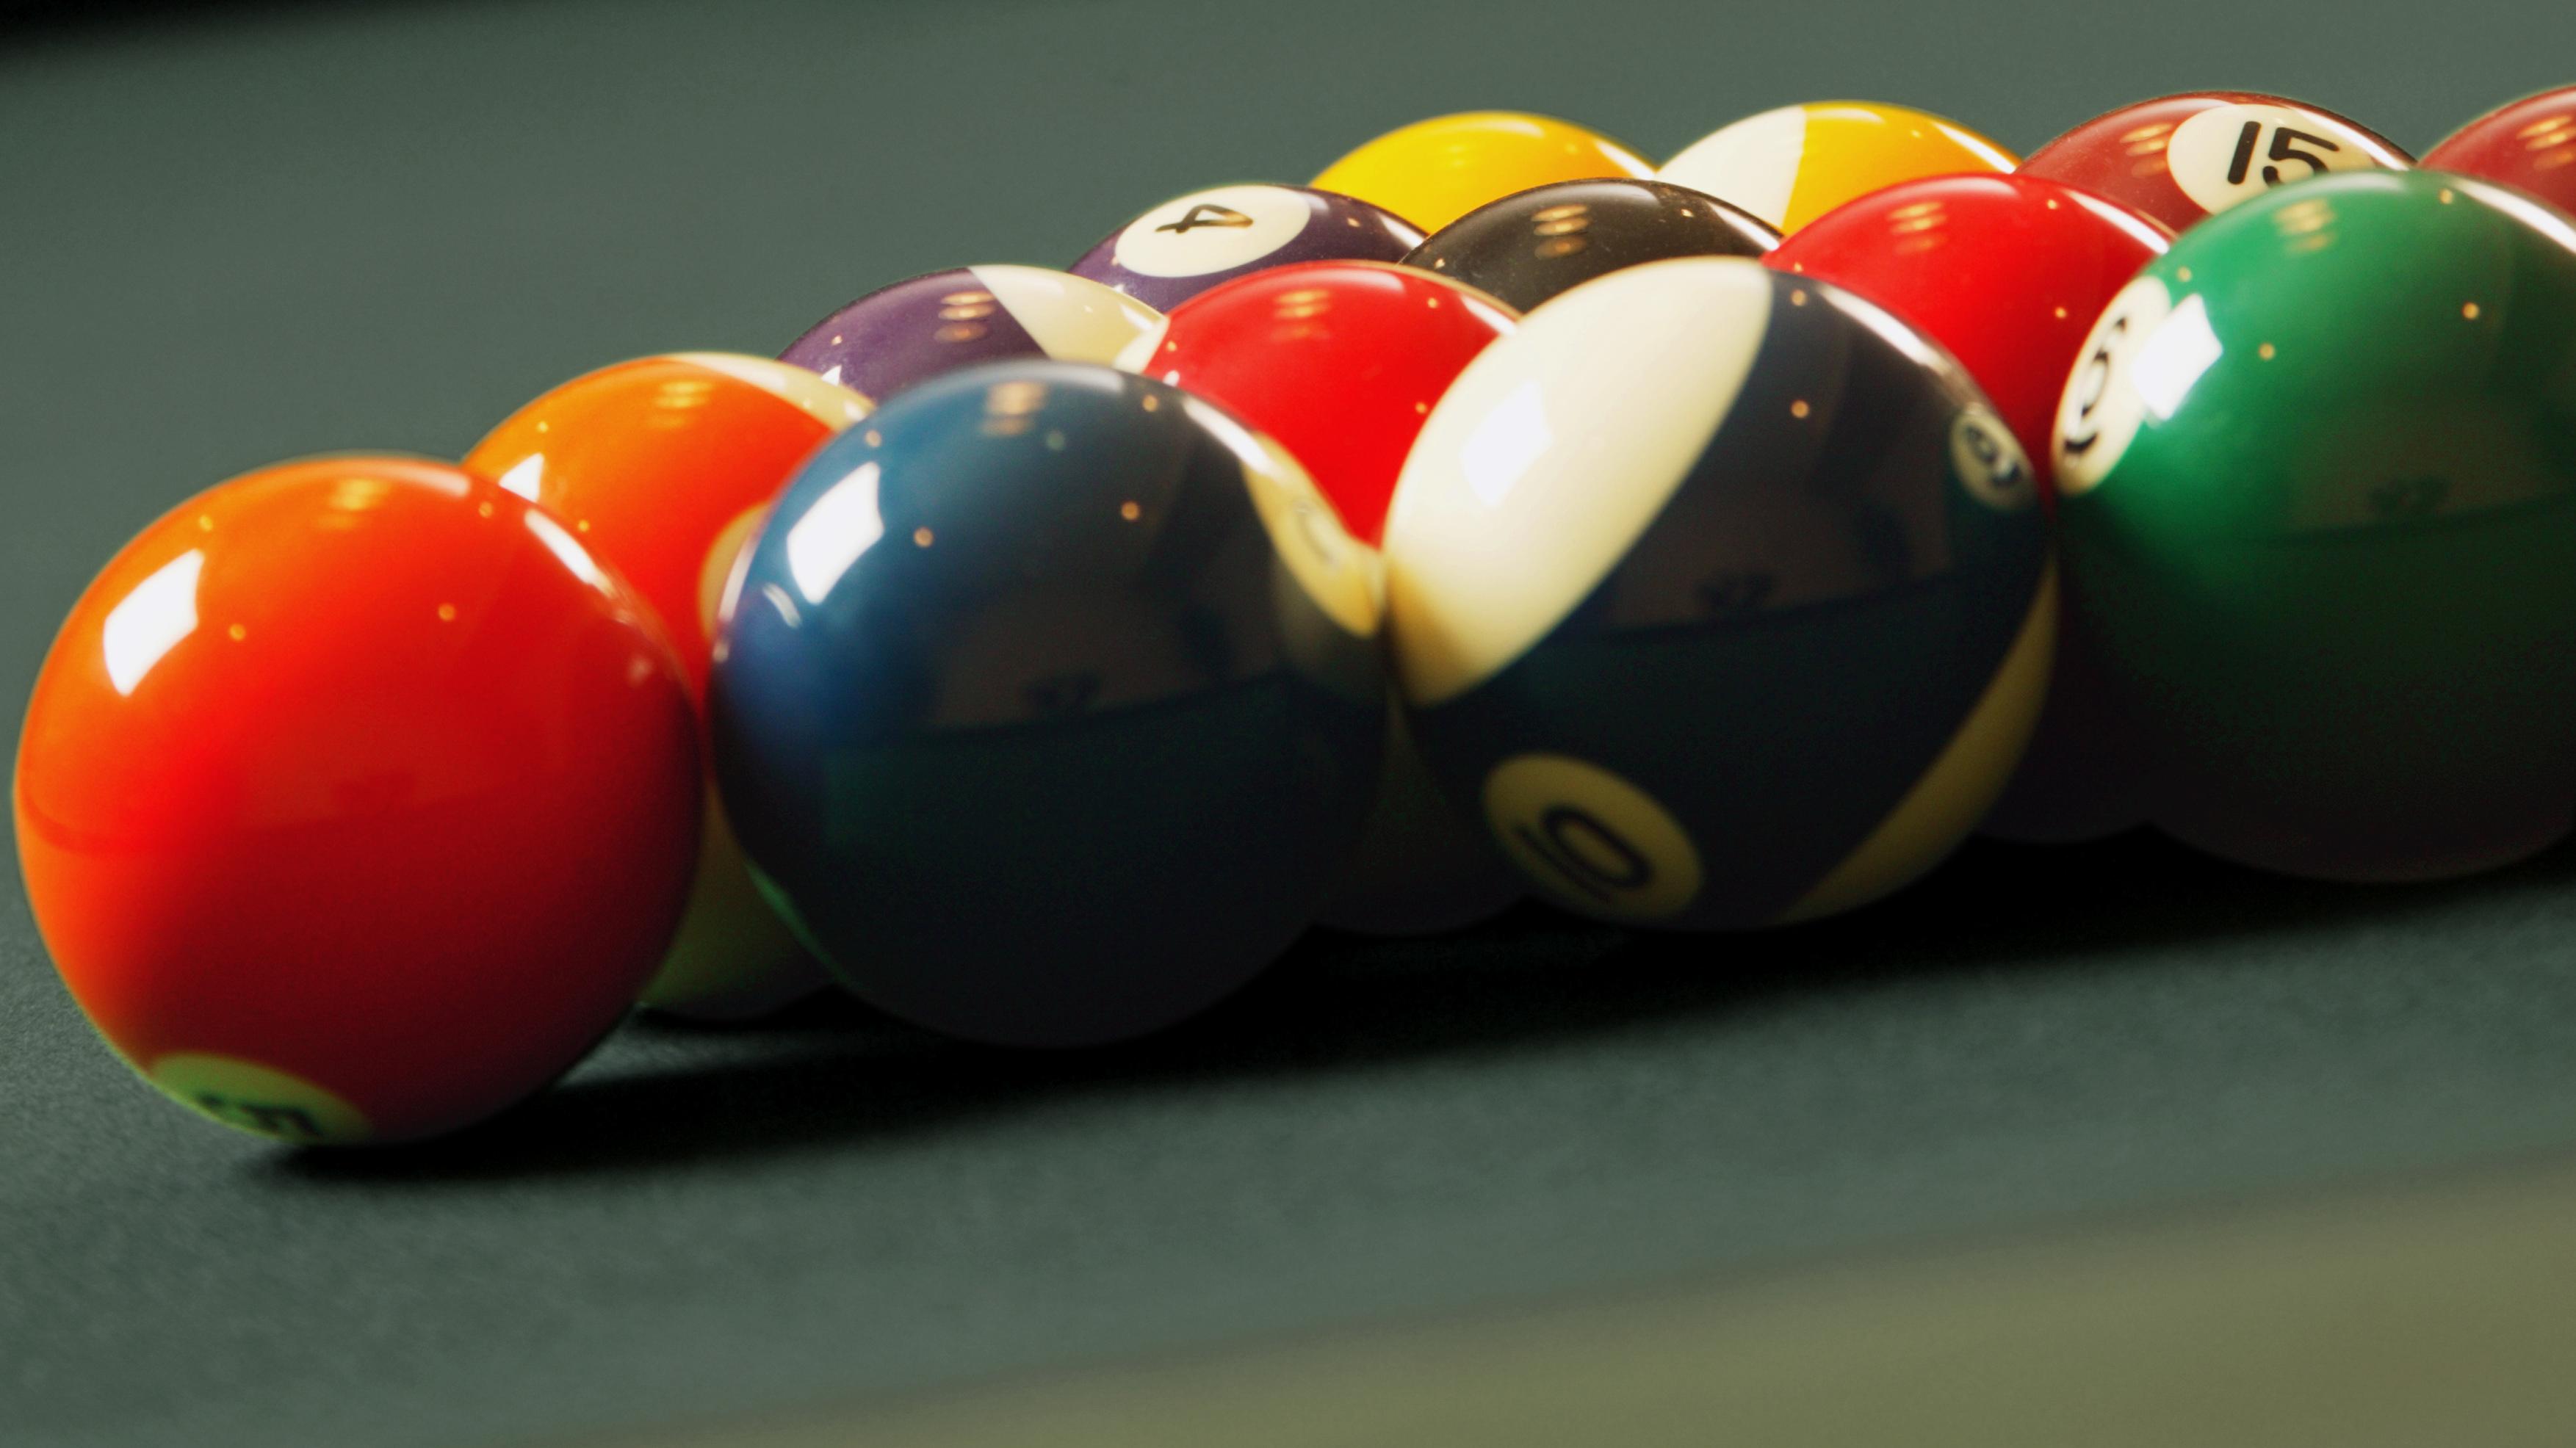 Billiards 8-Ball League